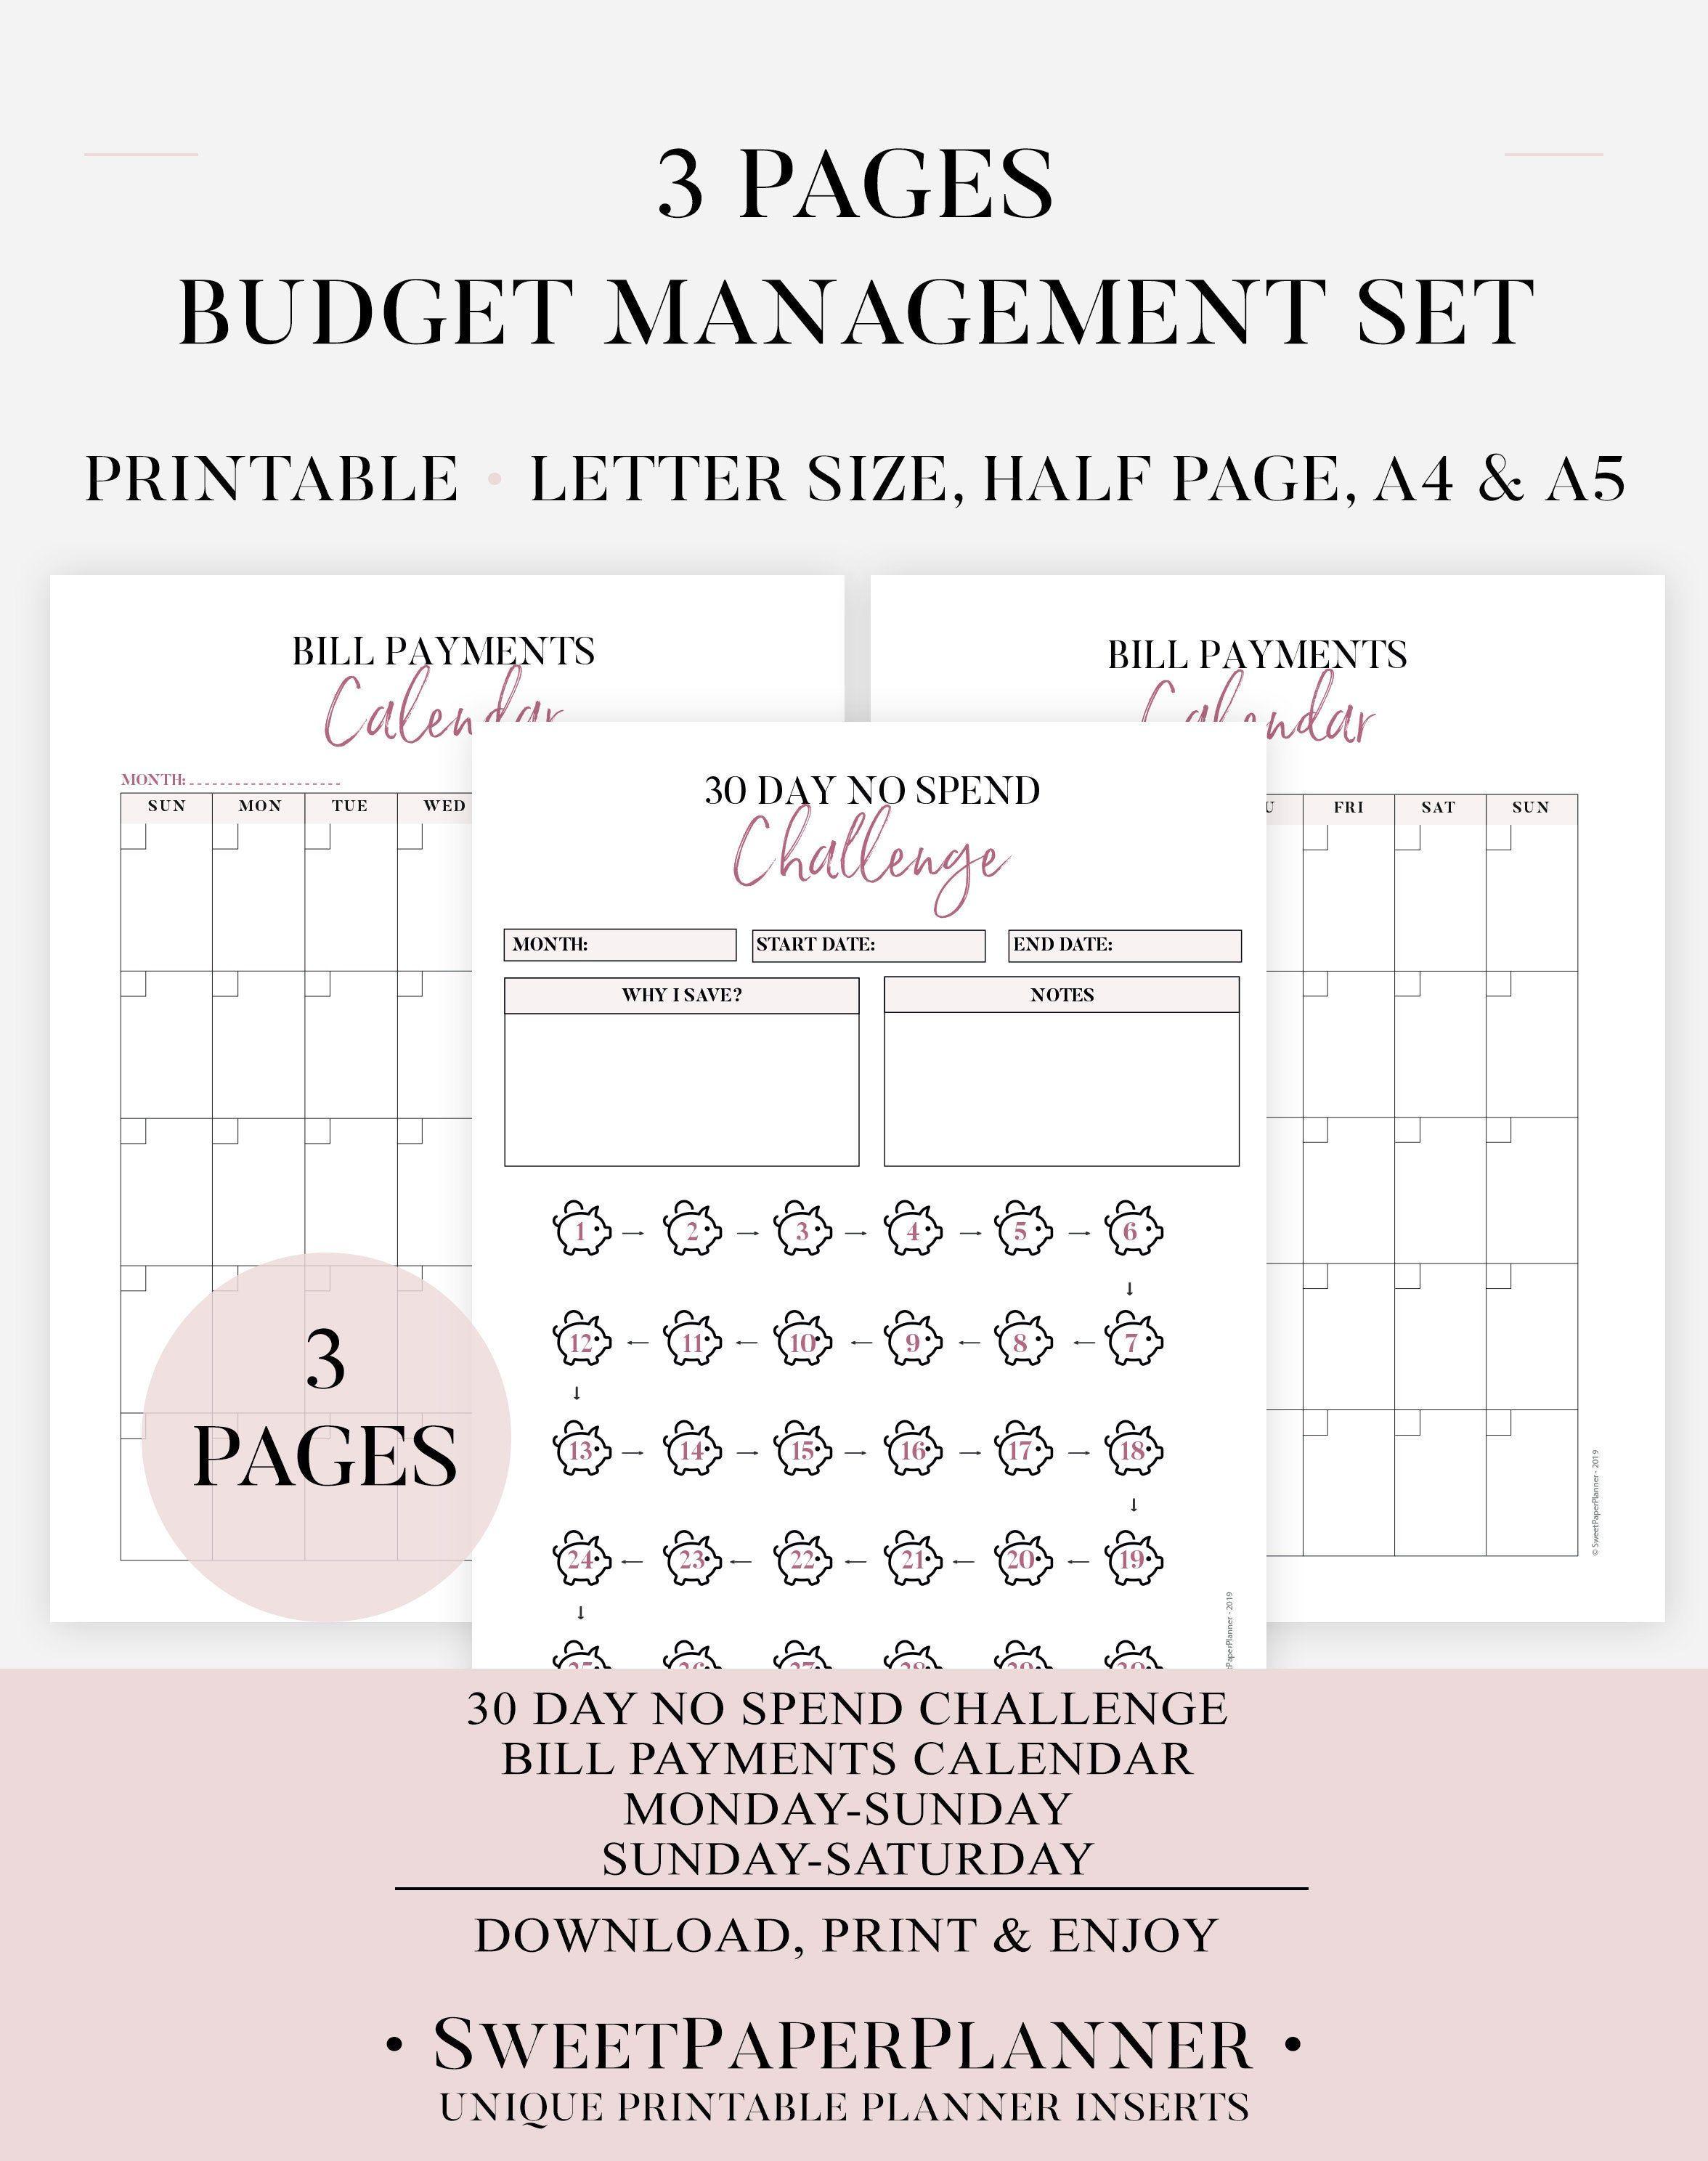 Budget Management Set Printable Bill Payments Calendar